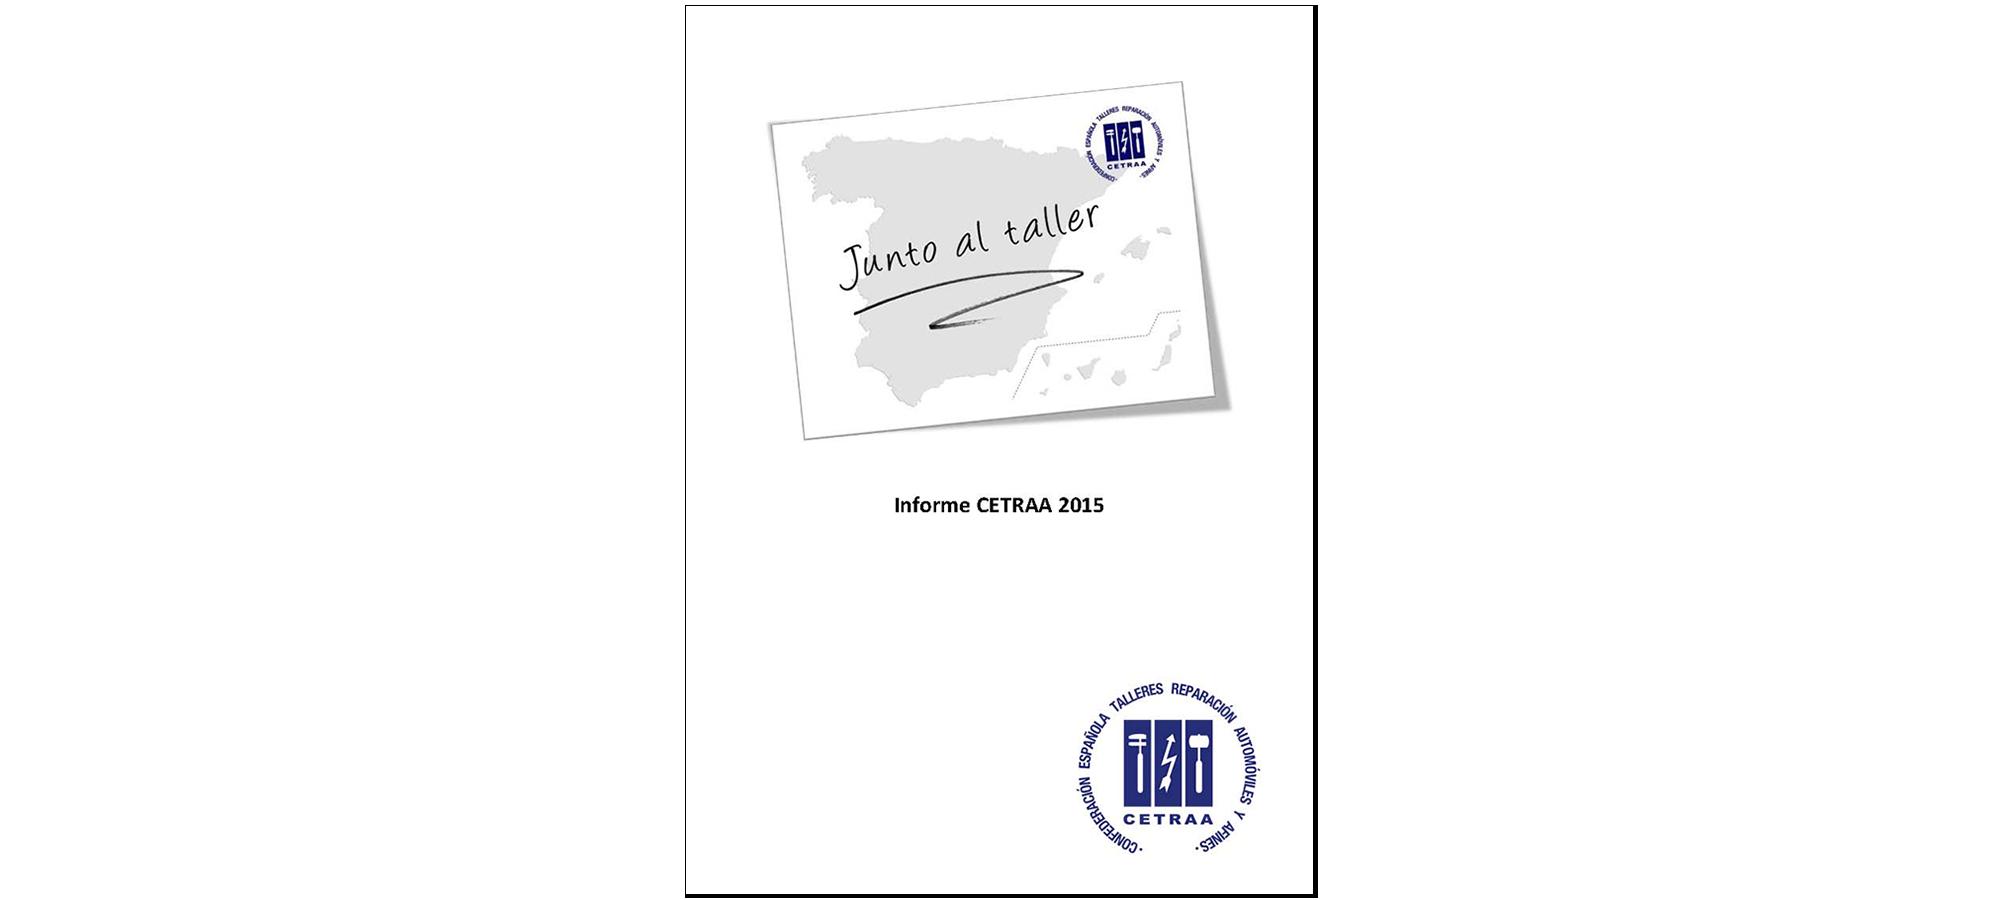 Informe CETRAA 2015